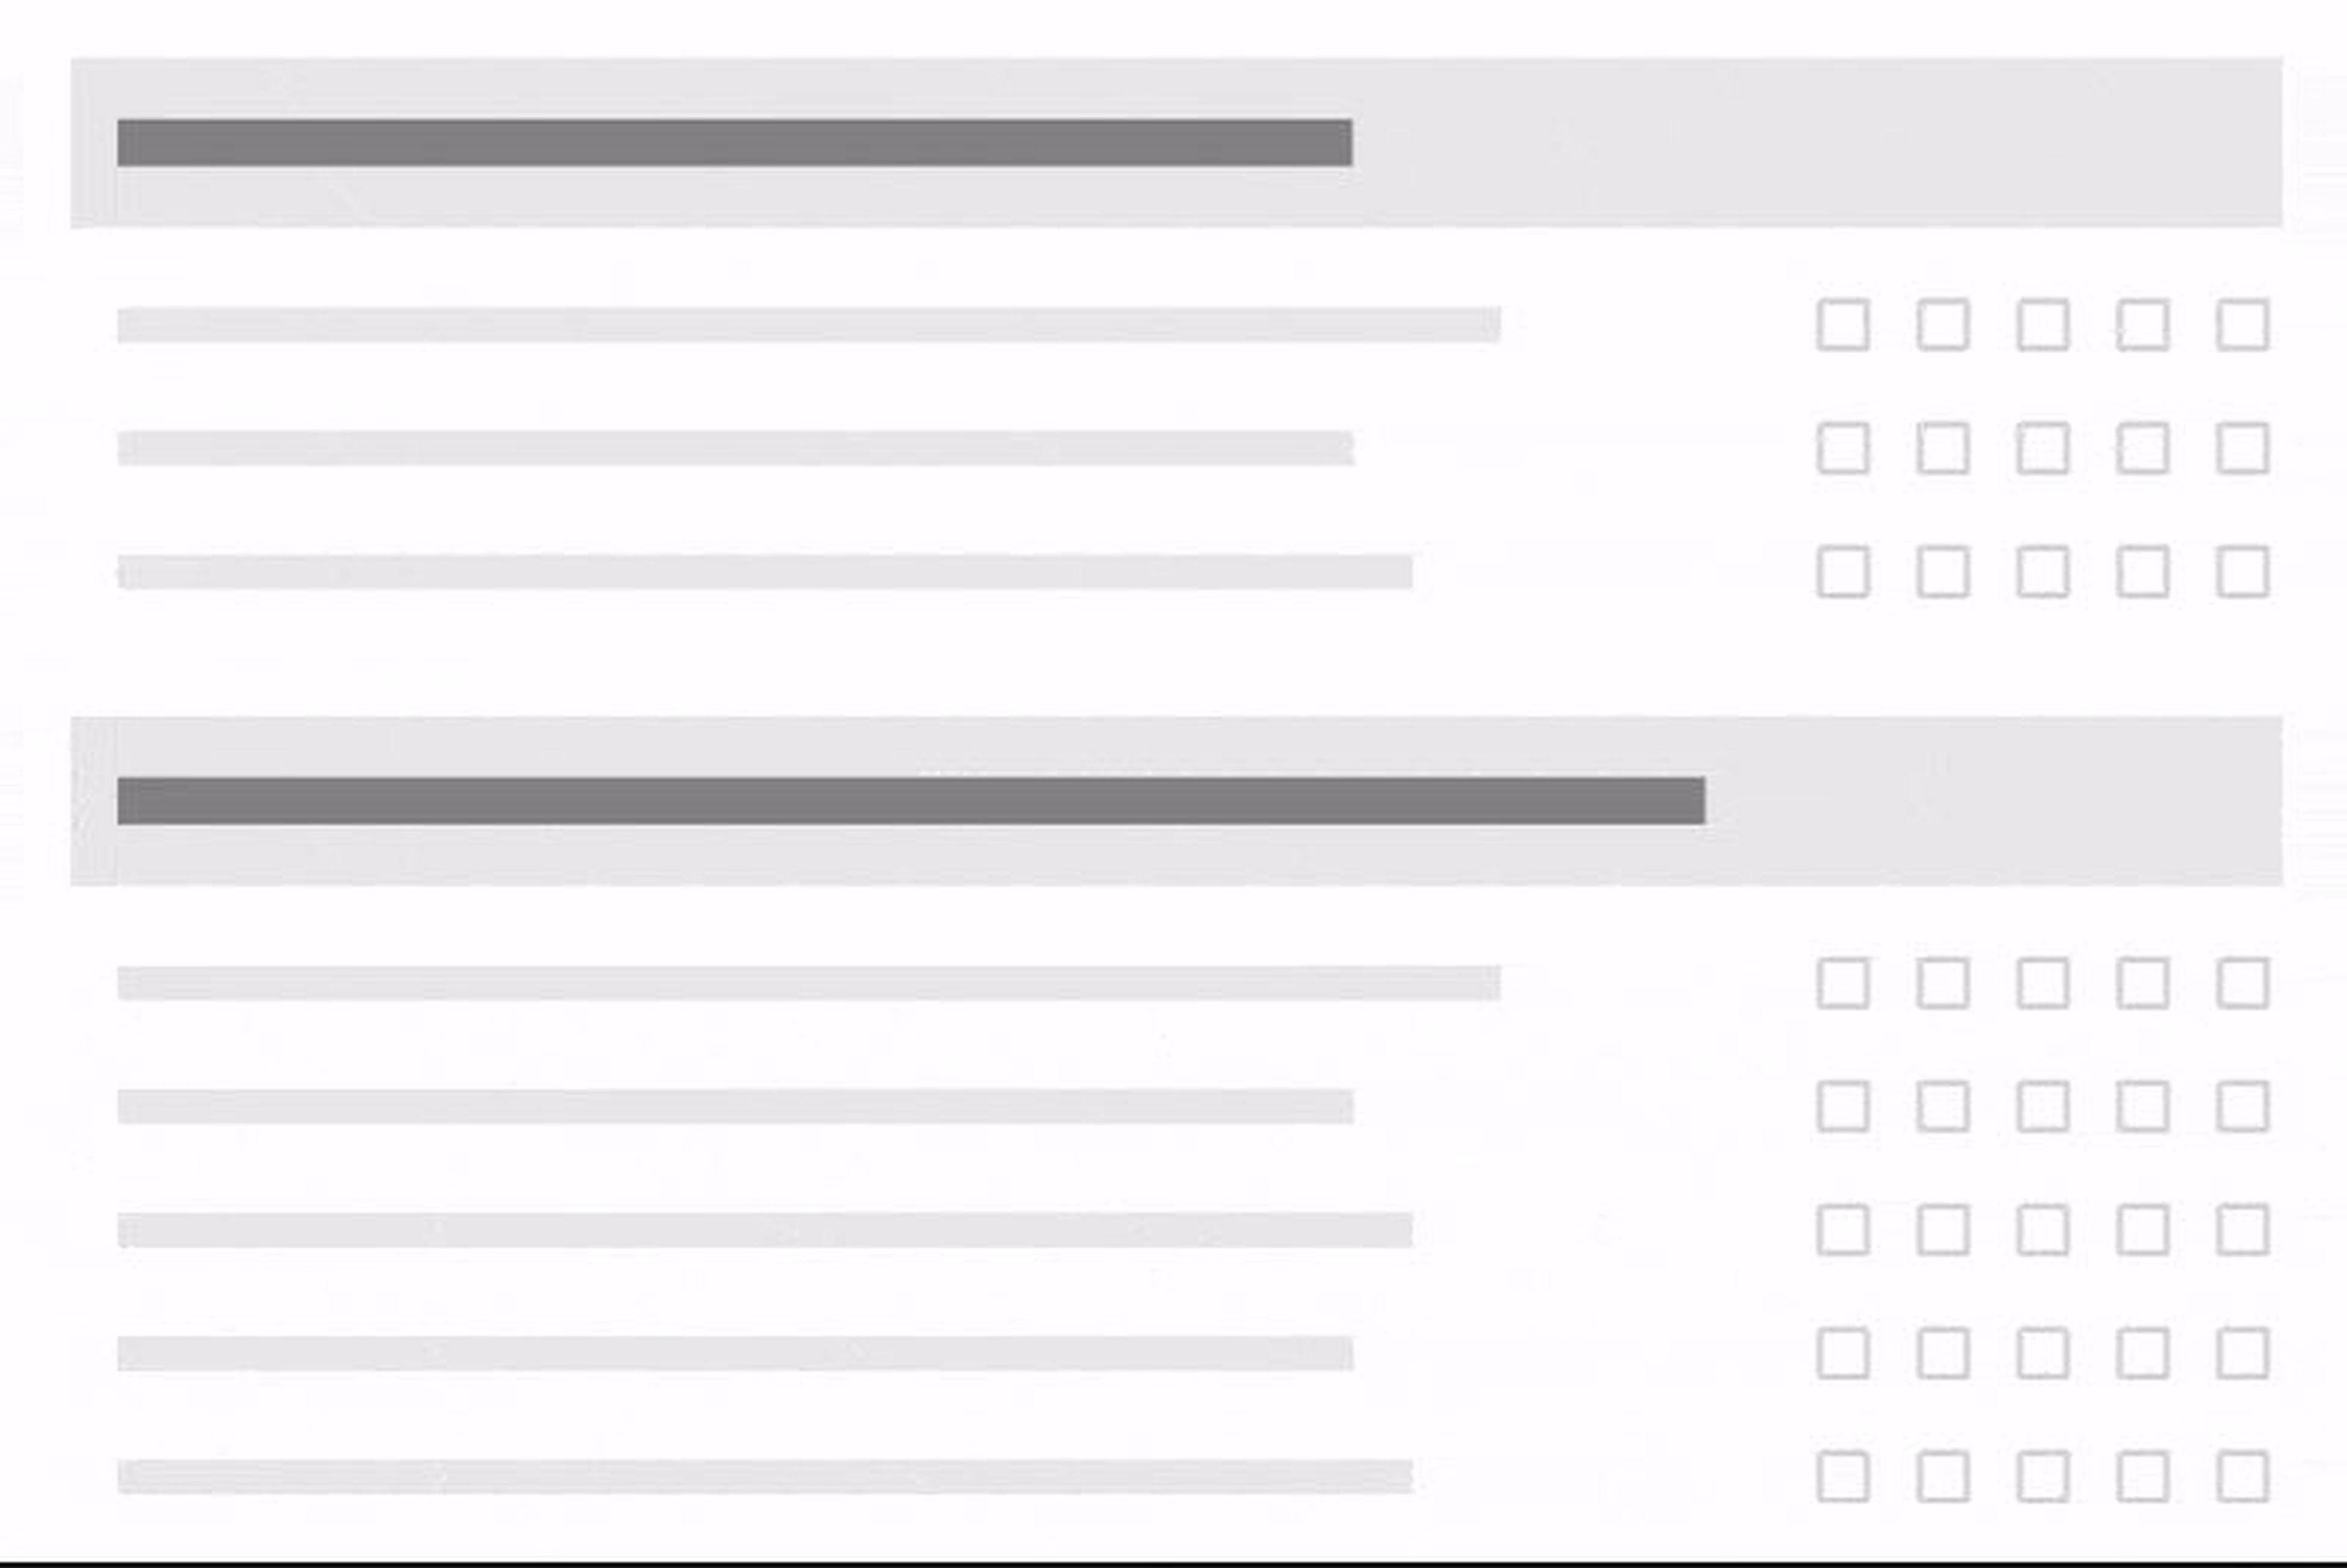 long-employee-survey